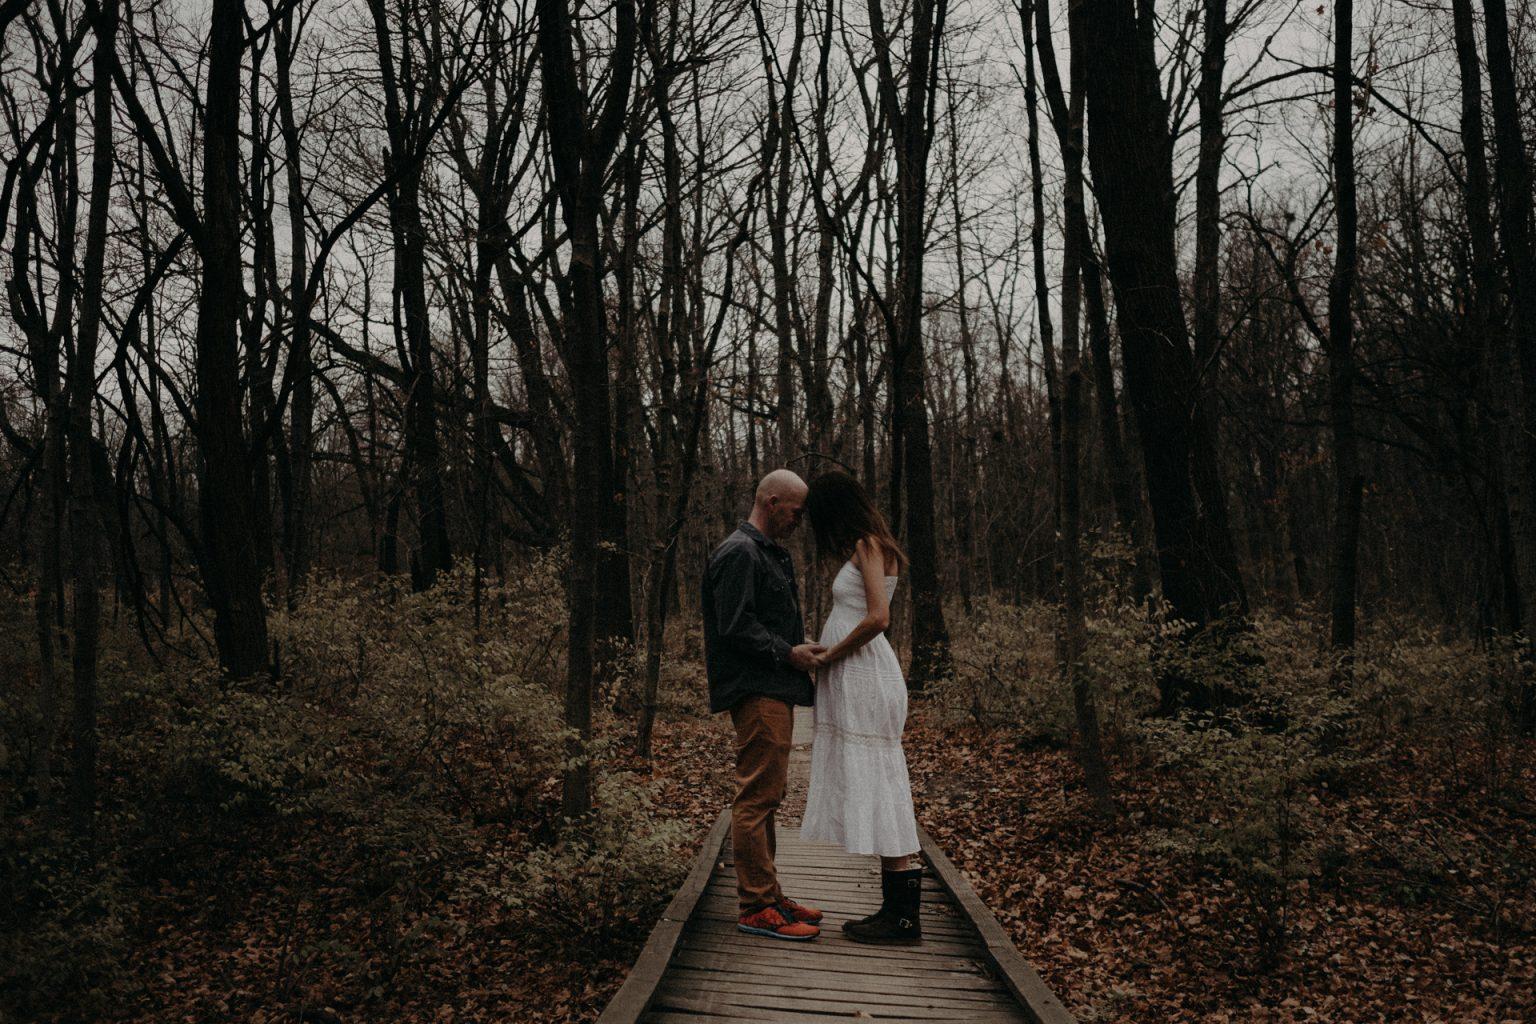 man pregnant woman woods forest illinois bridge